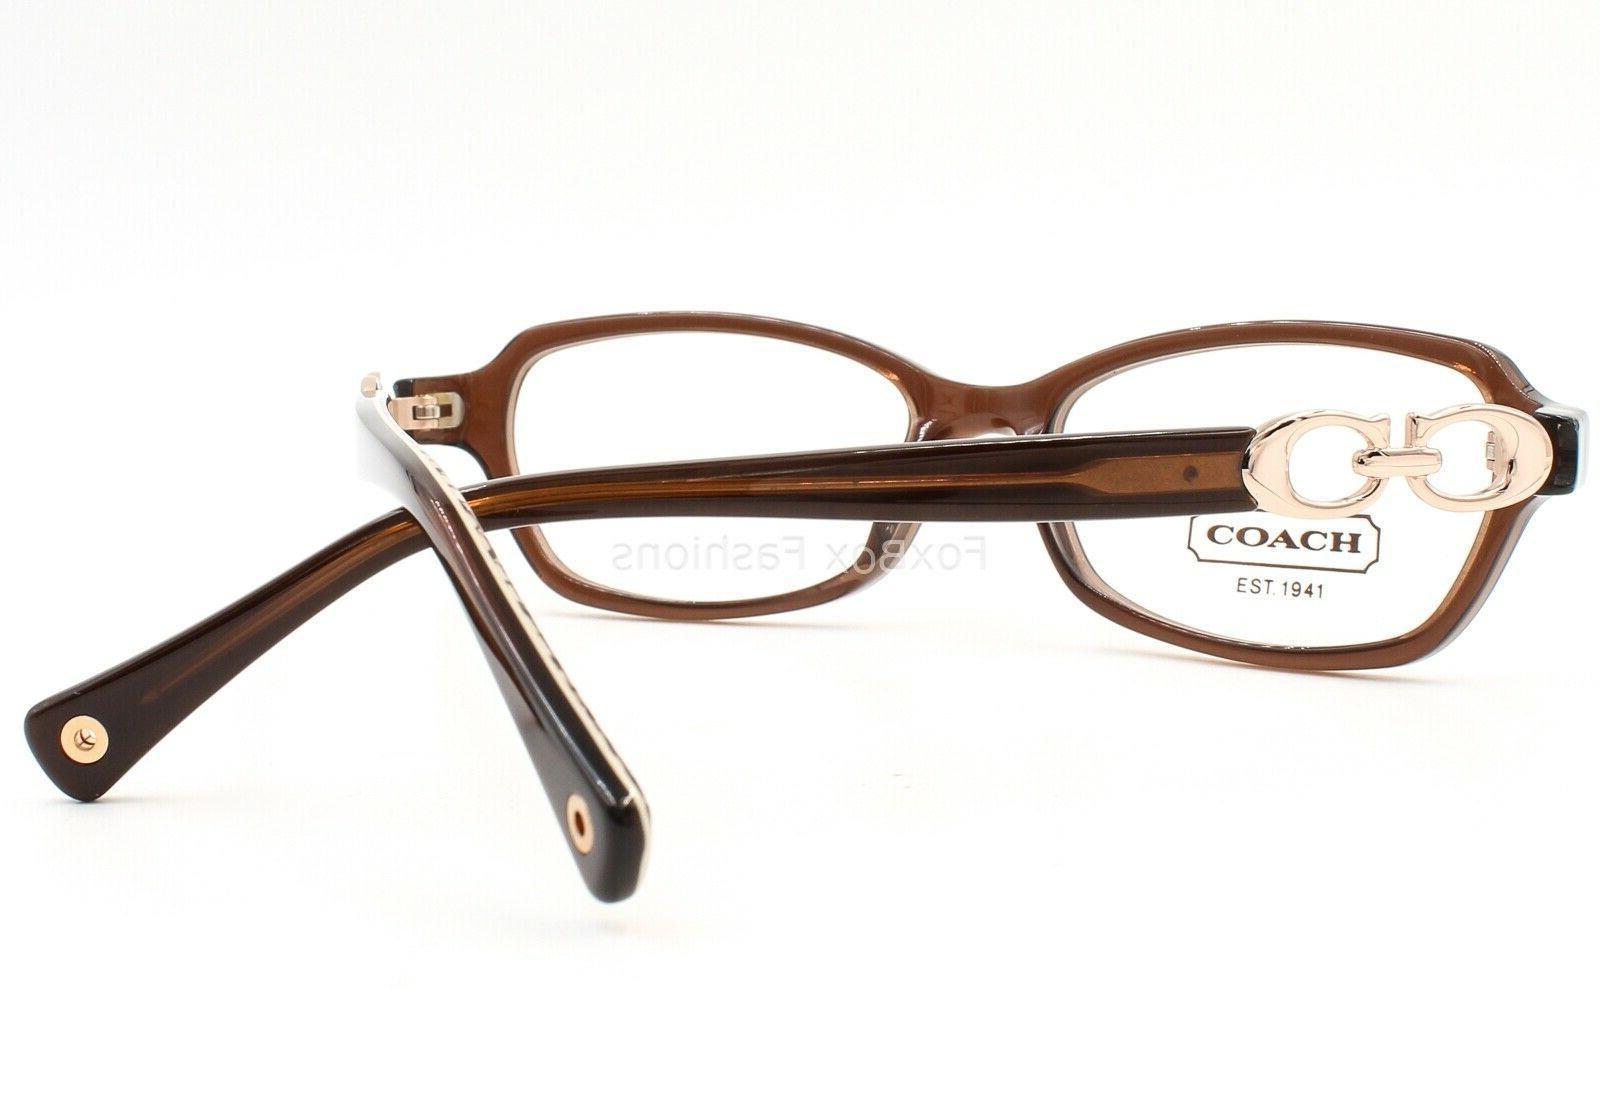 COACH Vanessa Eyeglasses Brown & Gold